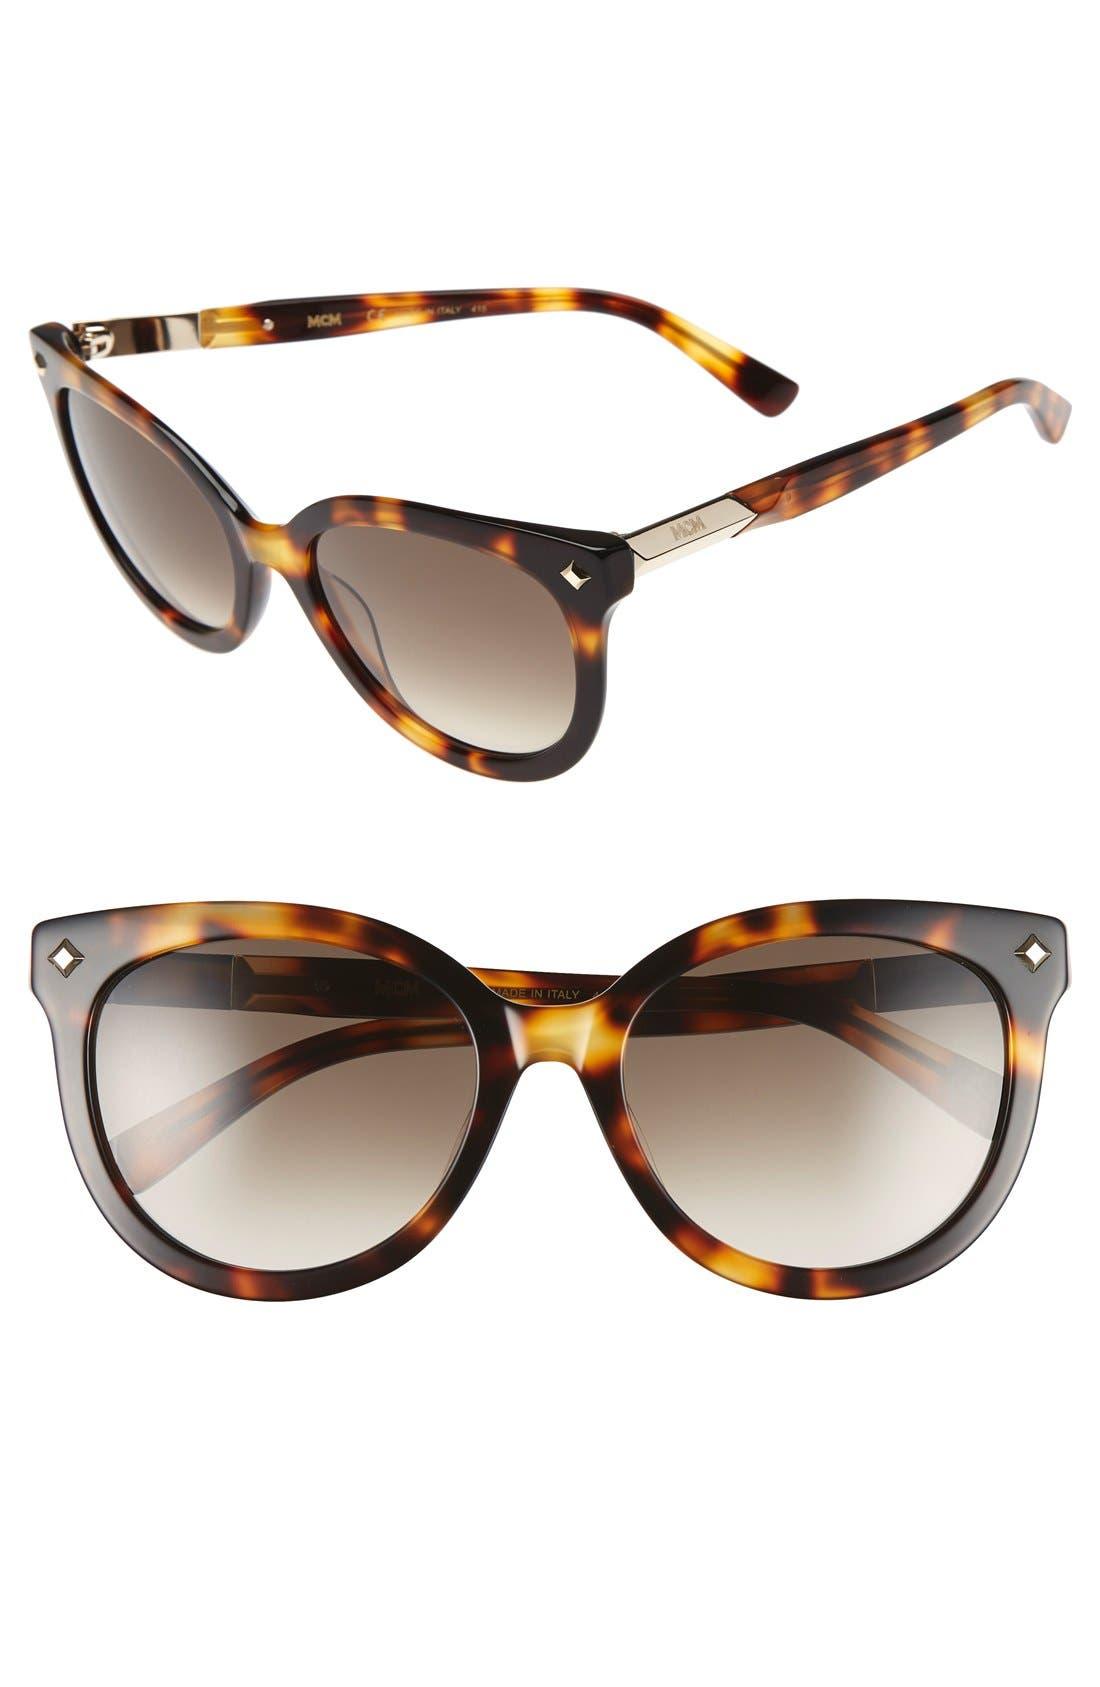 56mm Retro Sunglasses,                             Main thumbnail 1, color,                             Havana